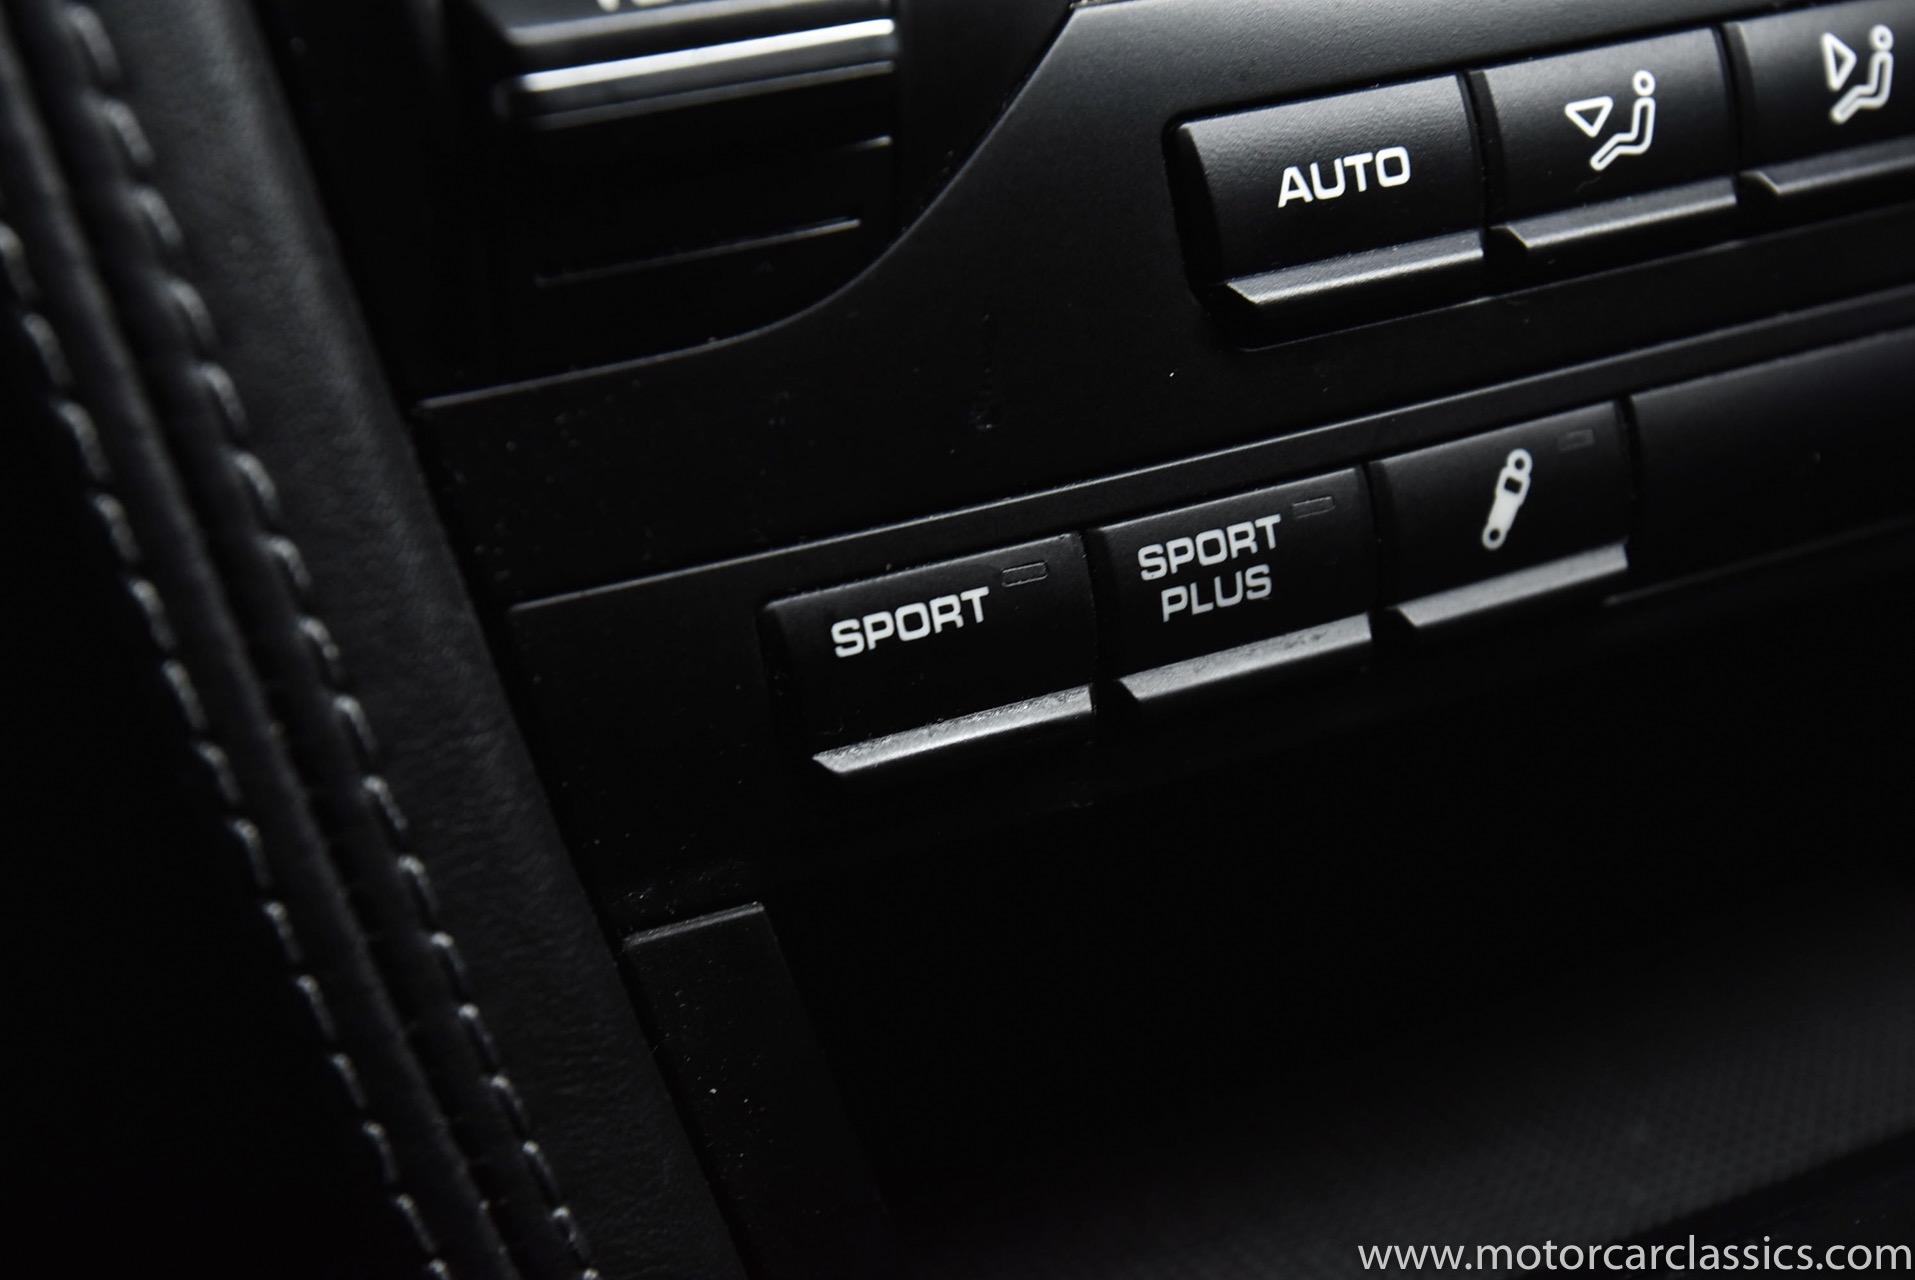 2012 Porsche 911 Turbo S